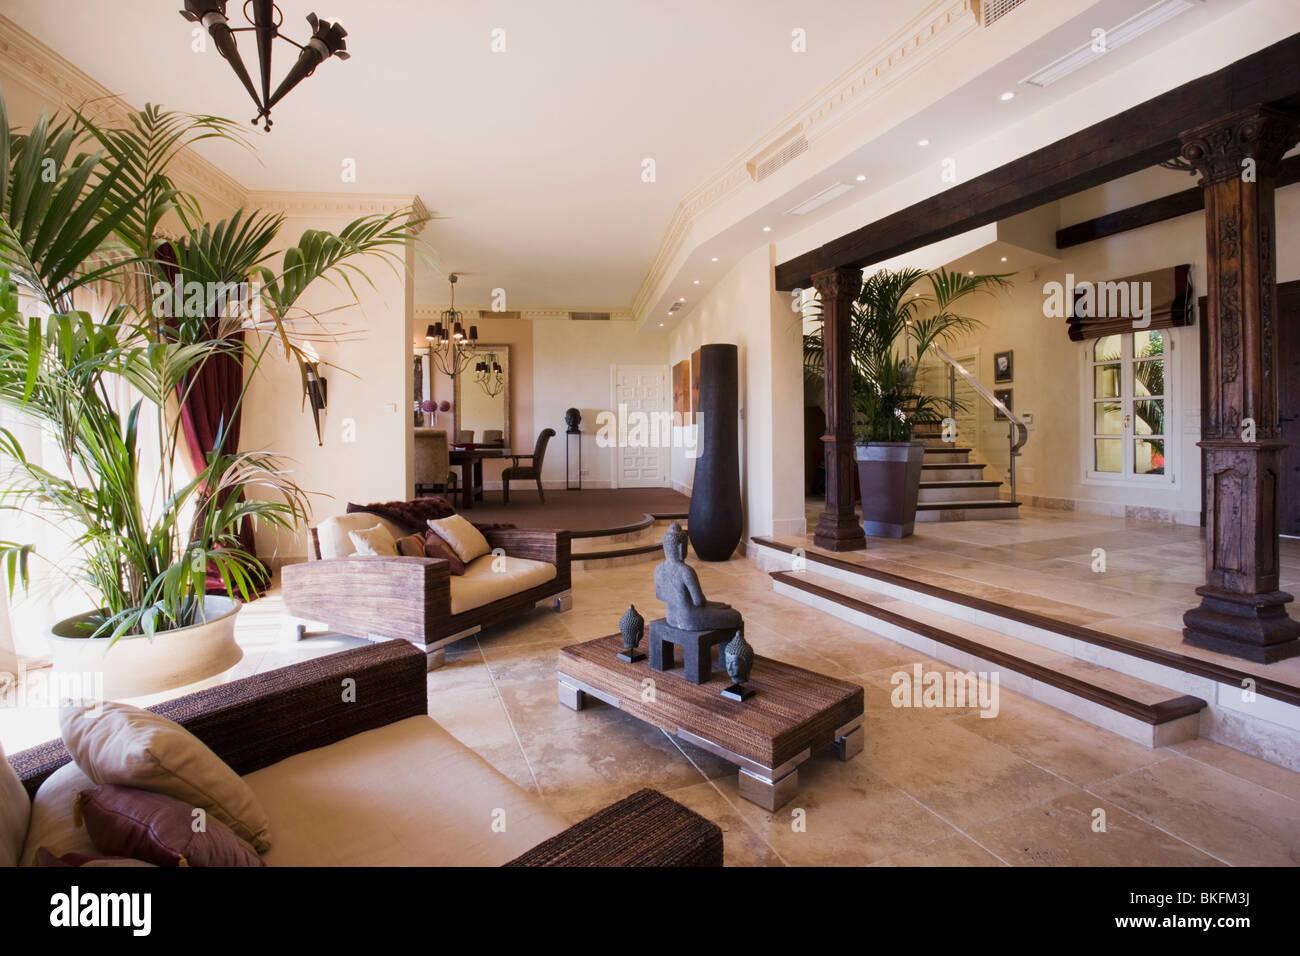 Tall Houseplant In Large Split Level Open Plan Hall Living Room